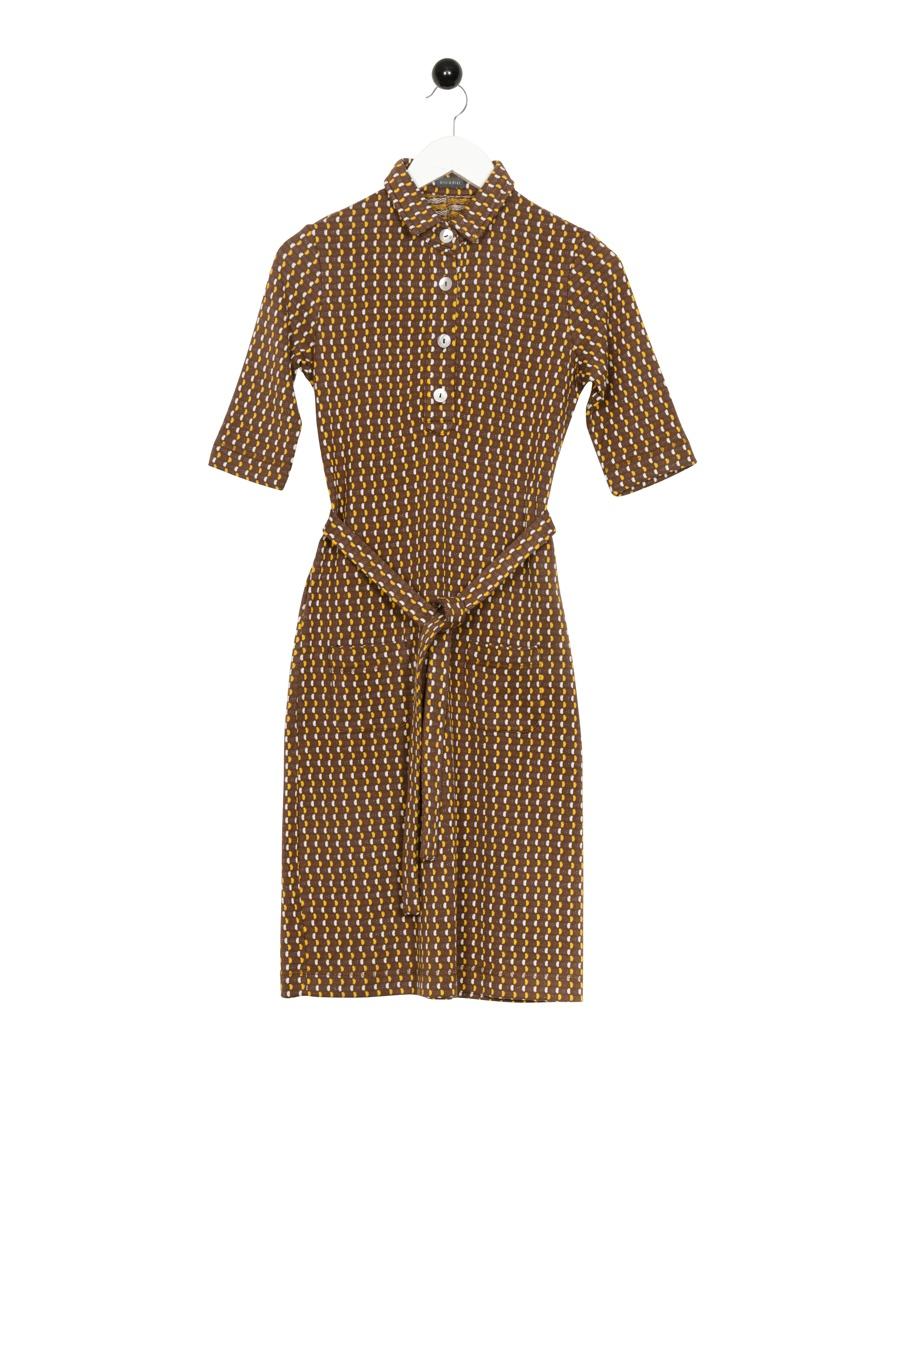 Orantes Dress